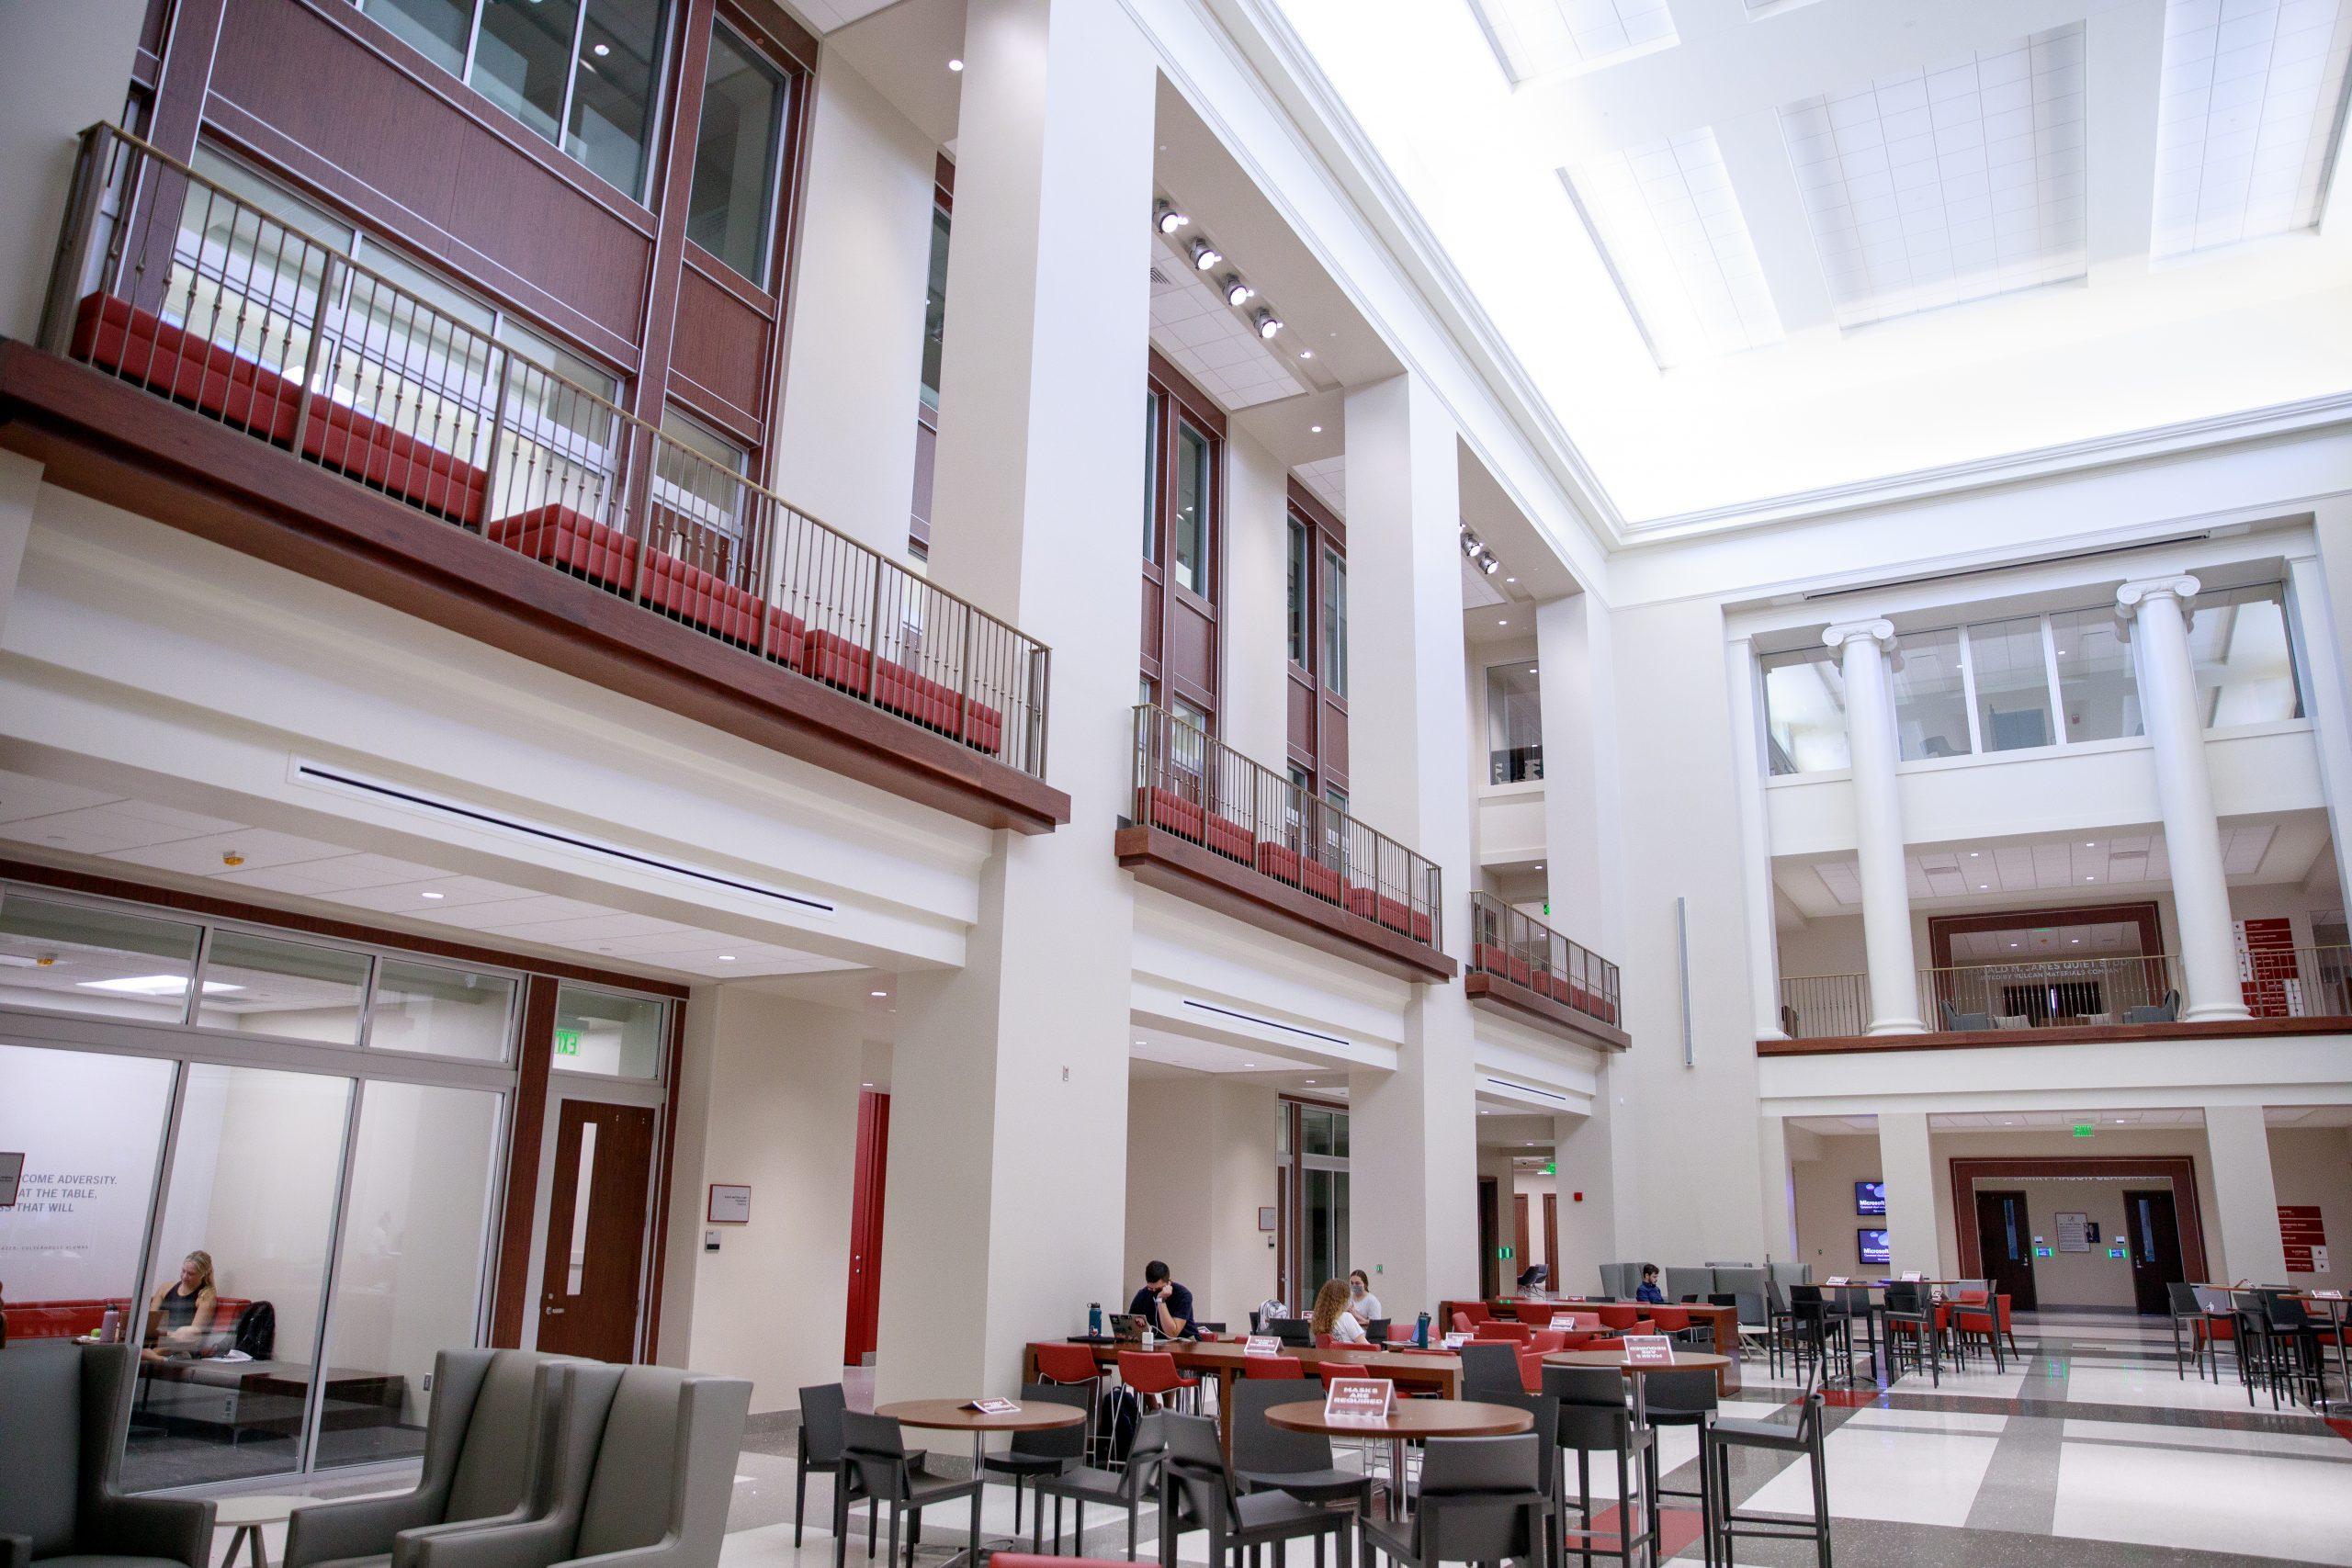 2109002, hewson hall